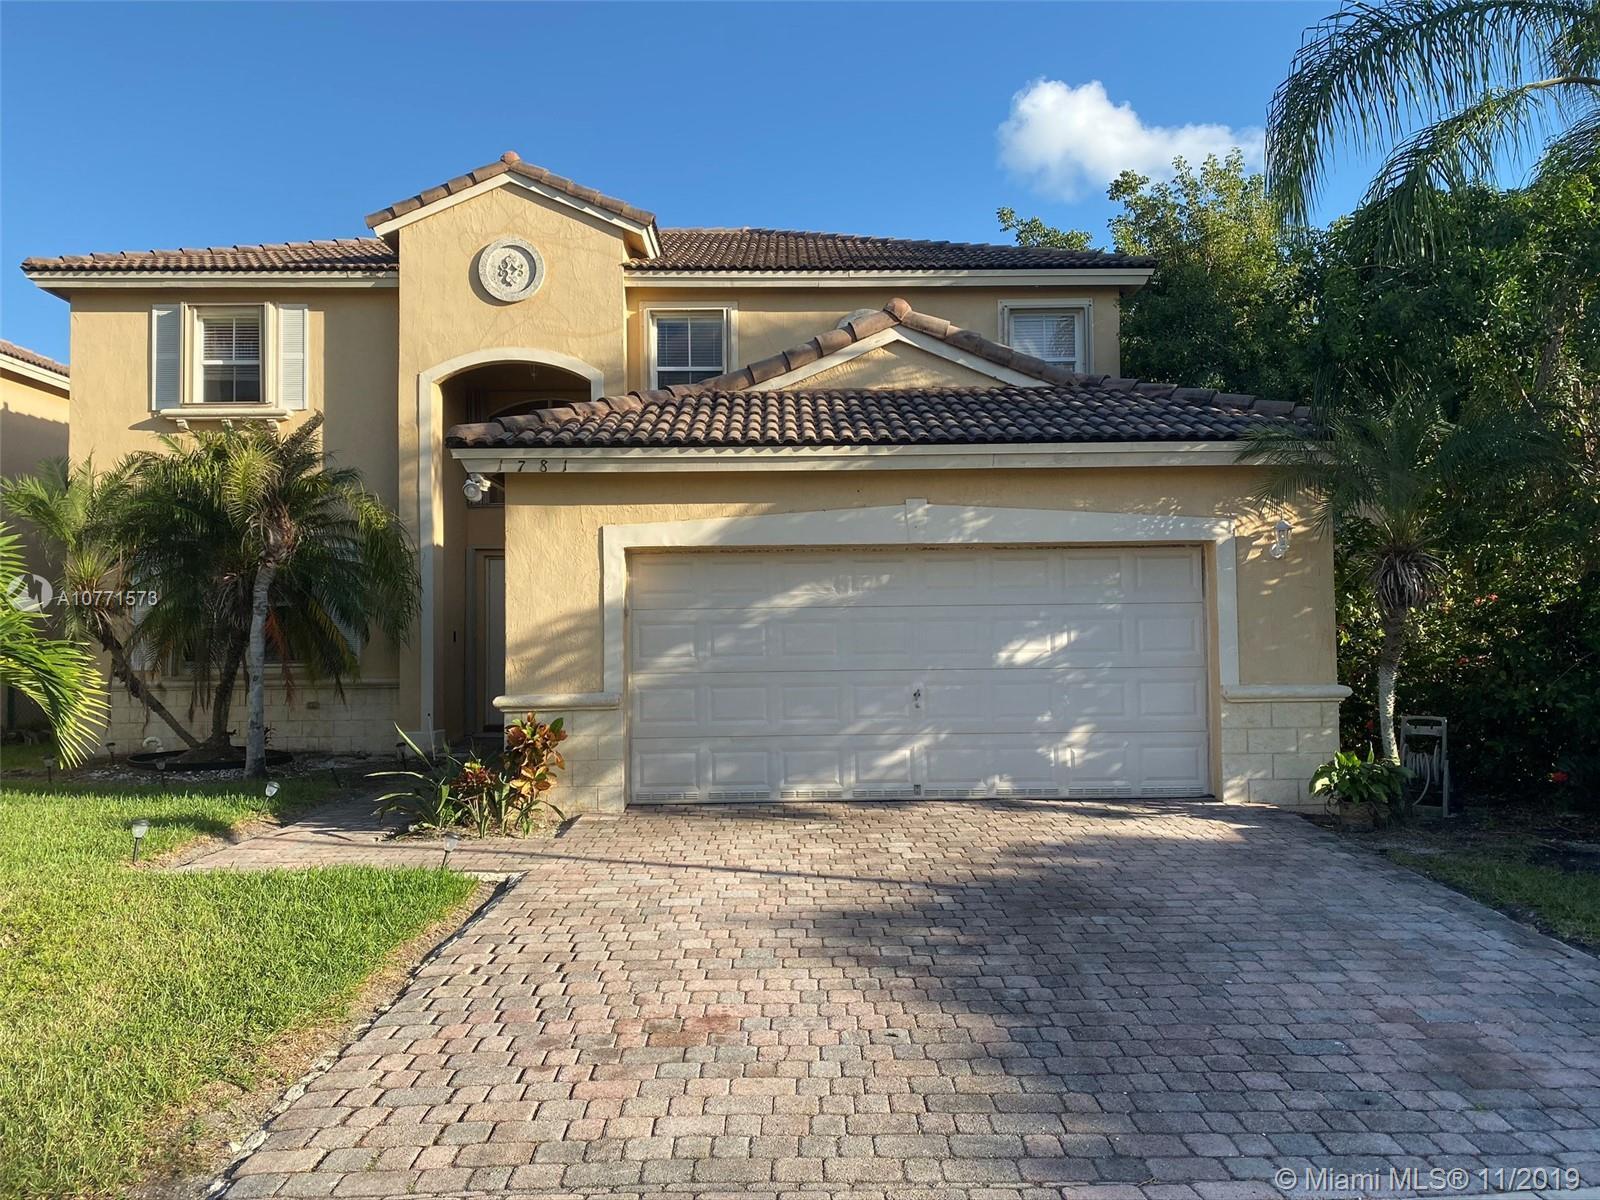 1781 SE 20th Rd, Homestead, FL 33035 - Homestead, FL real estate listing